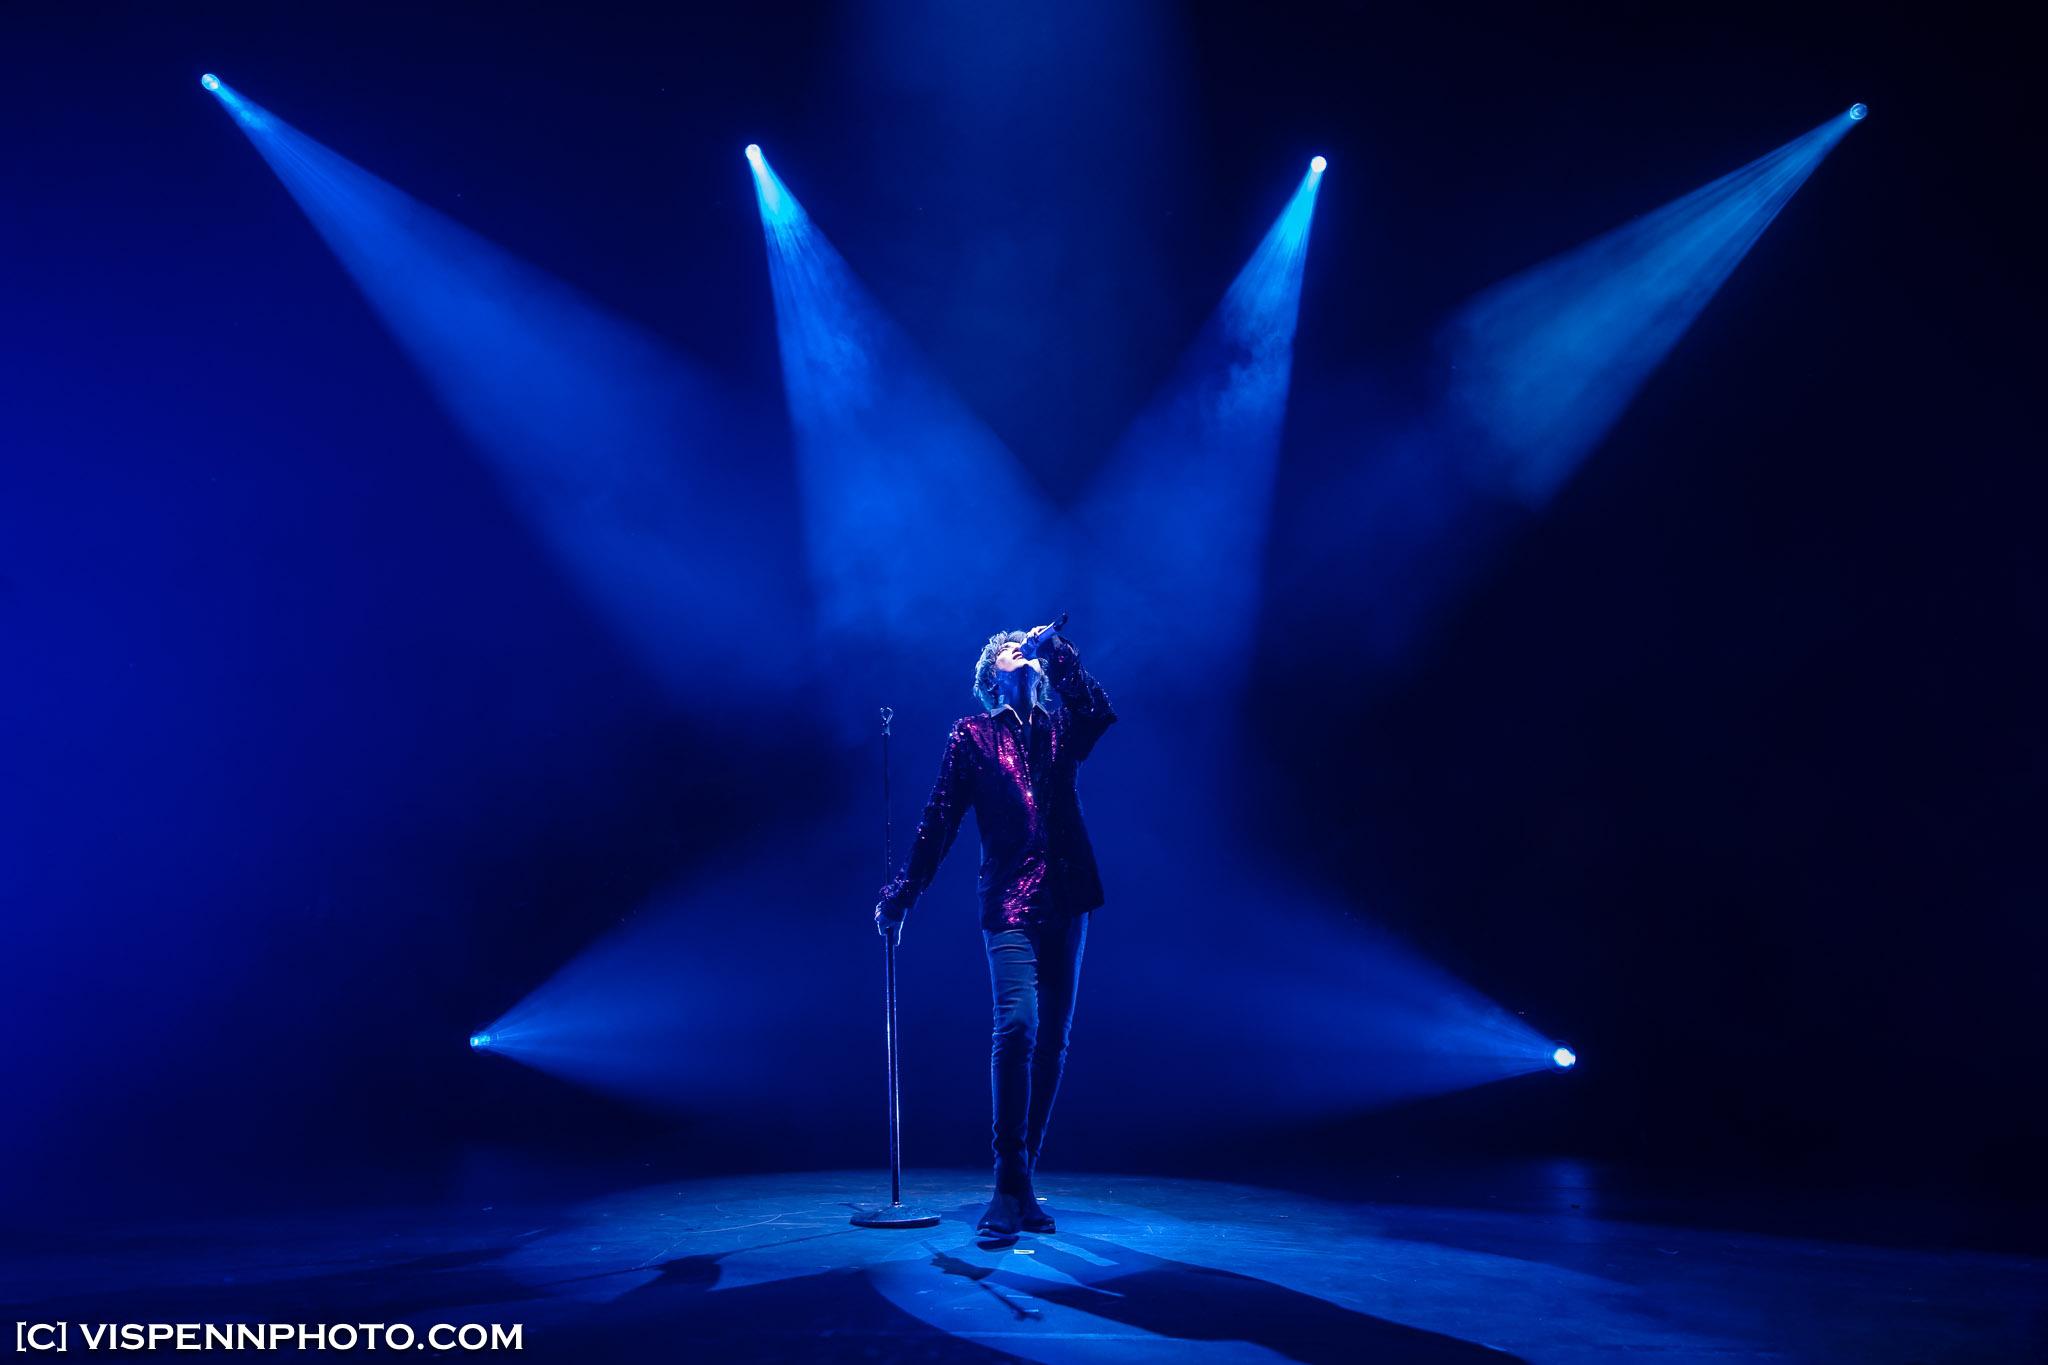 Melbourne CONCERTS Photography 墨尔本 演唱会 照片 摄影师 VISPENN JokerXUE 1P 2294 1DX VISPENN